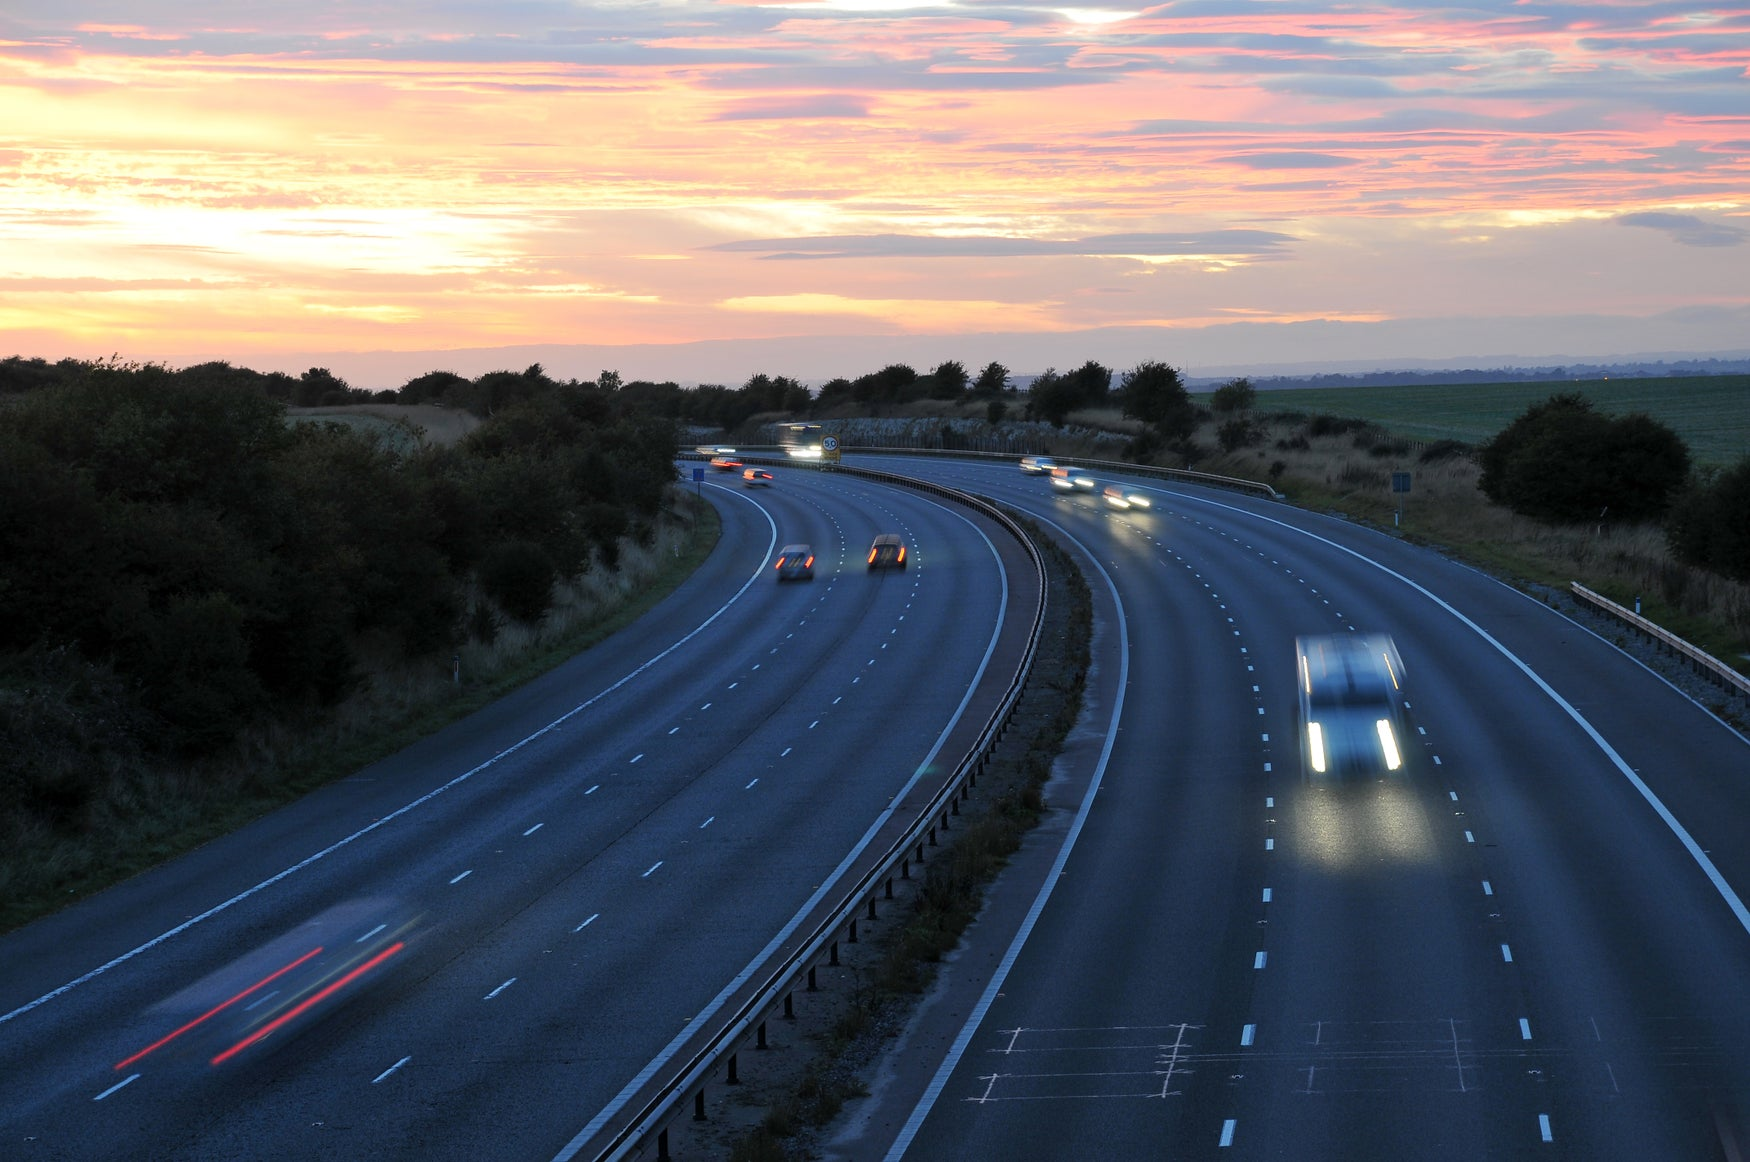 Curving motorway sunset